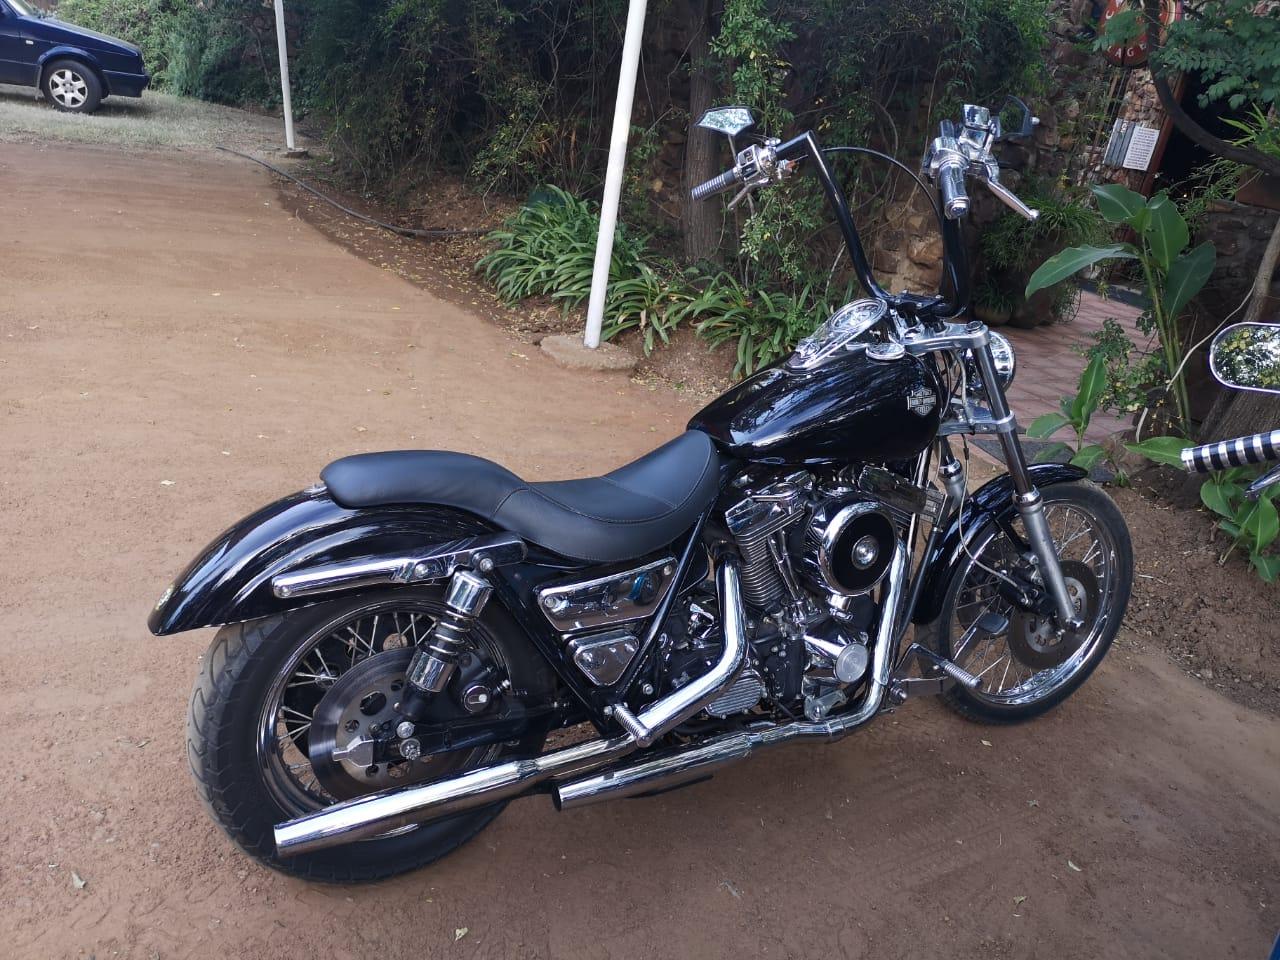 1996 Harley Davidson FXR